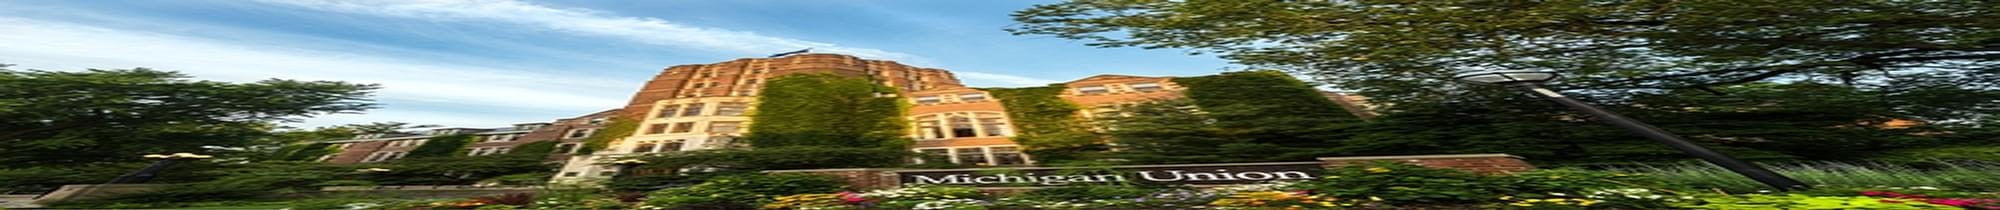 Umich Calendar 2022.University Of Michigan Umich Ann Arbor Admission Criteria Application Deadlines 2021